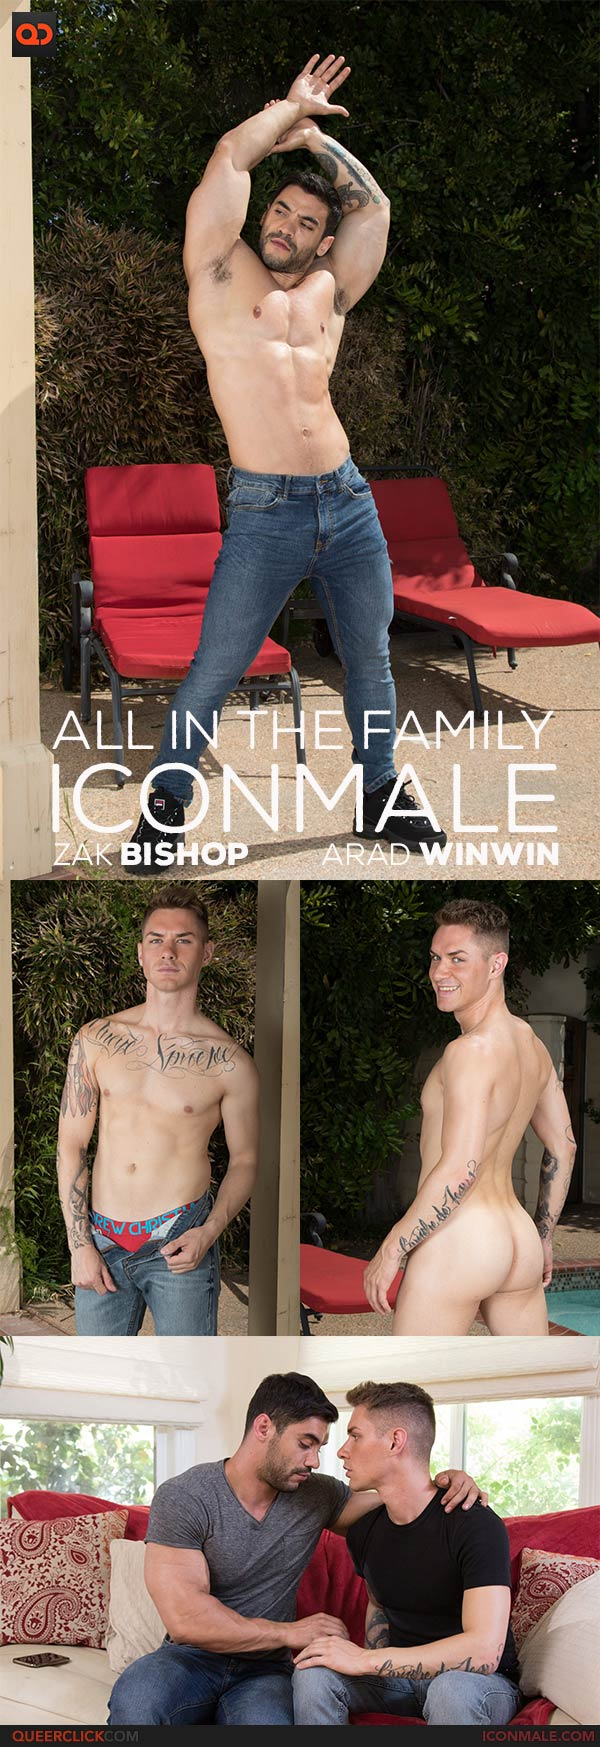 IconMale: Zak Bishop and Arad Winwin